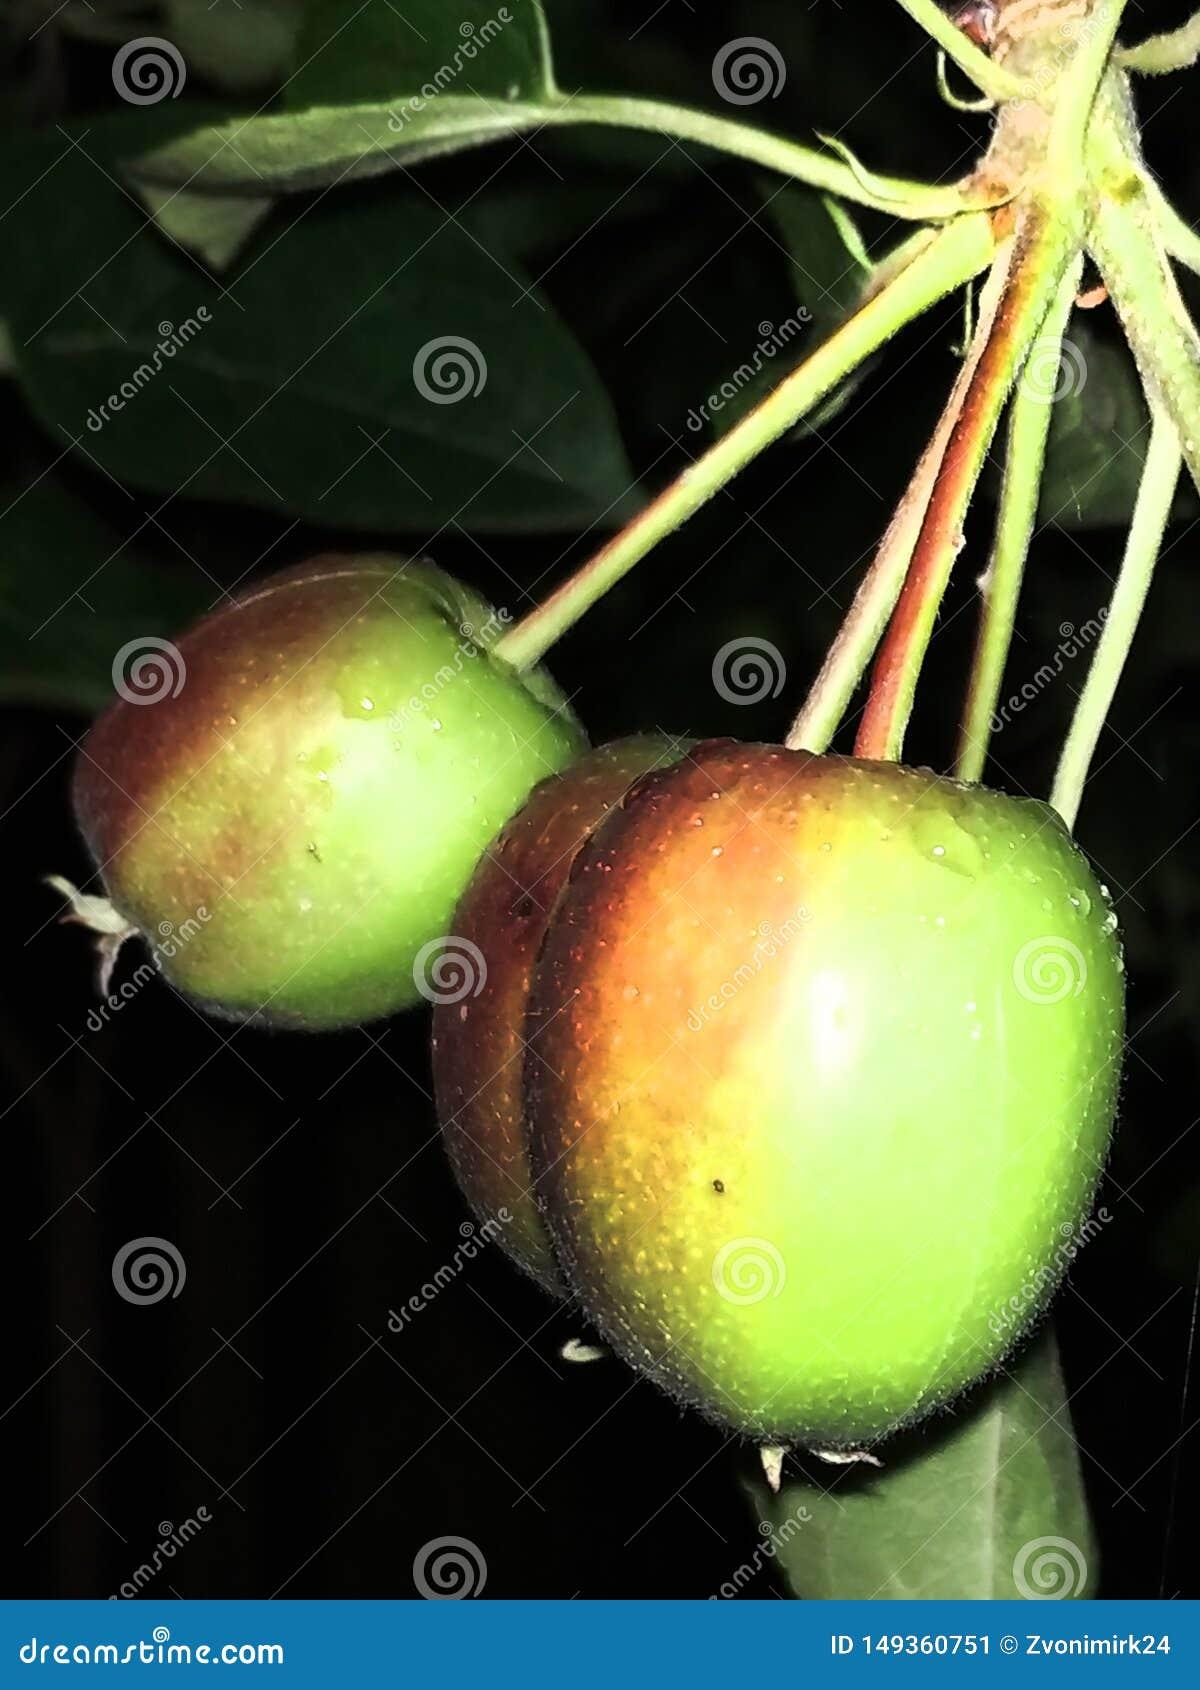 Beautiful little apples. At night.